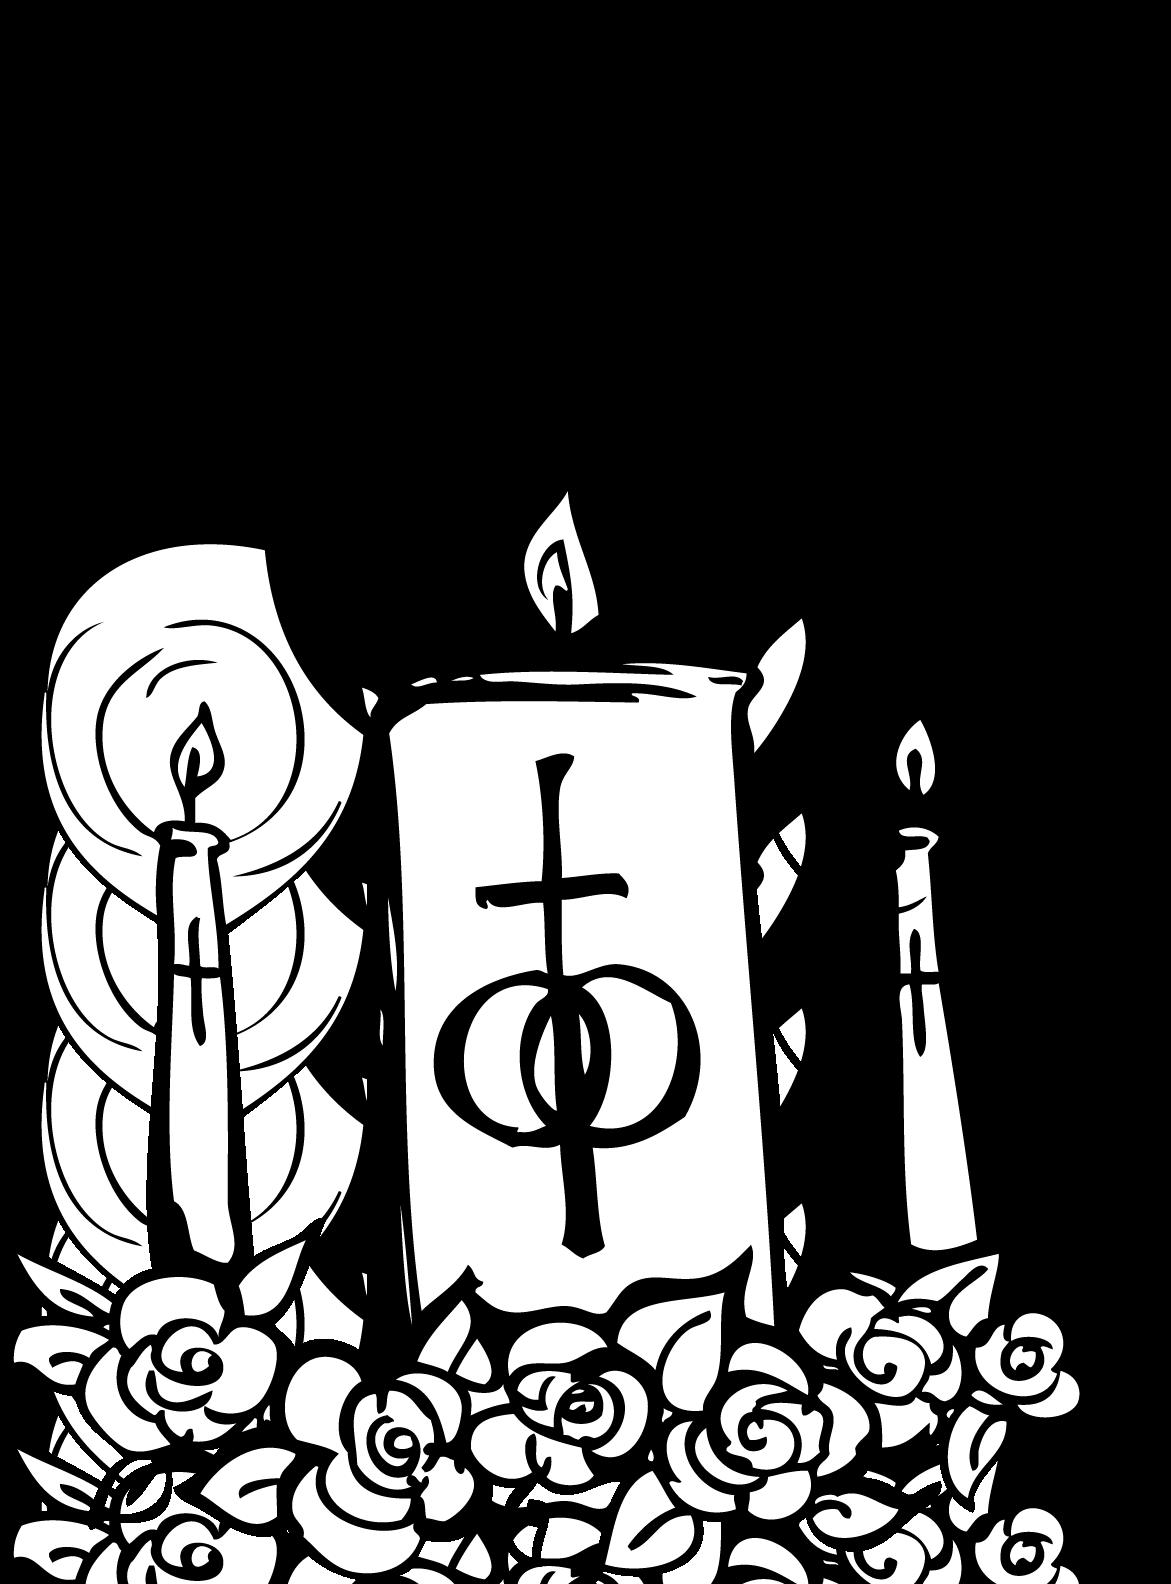 Catholic Church Catholicism Wedding Clip art - Church Candles